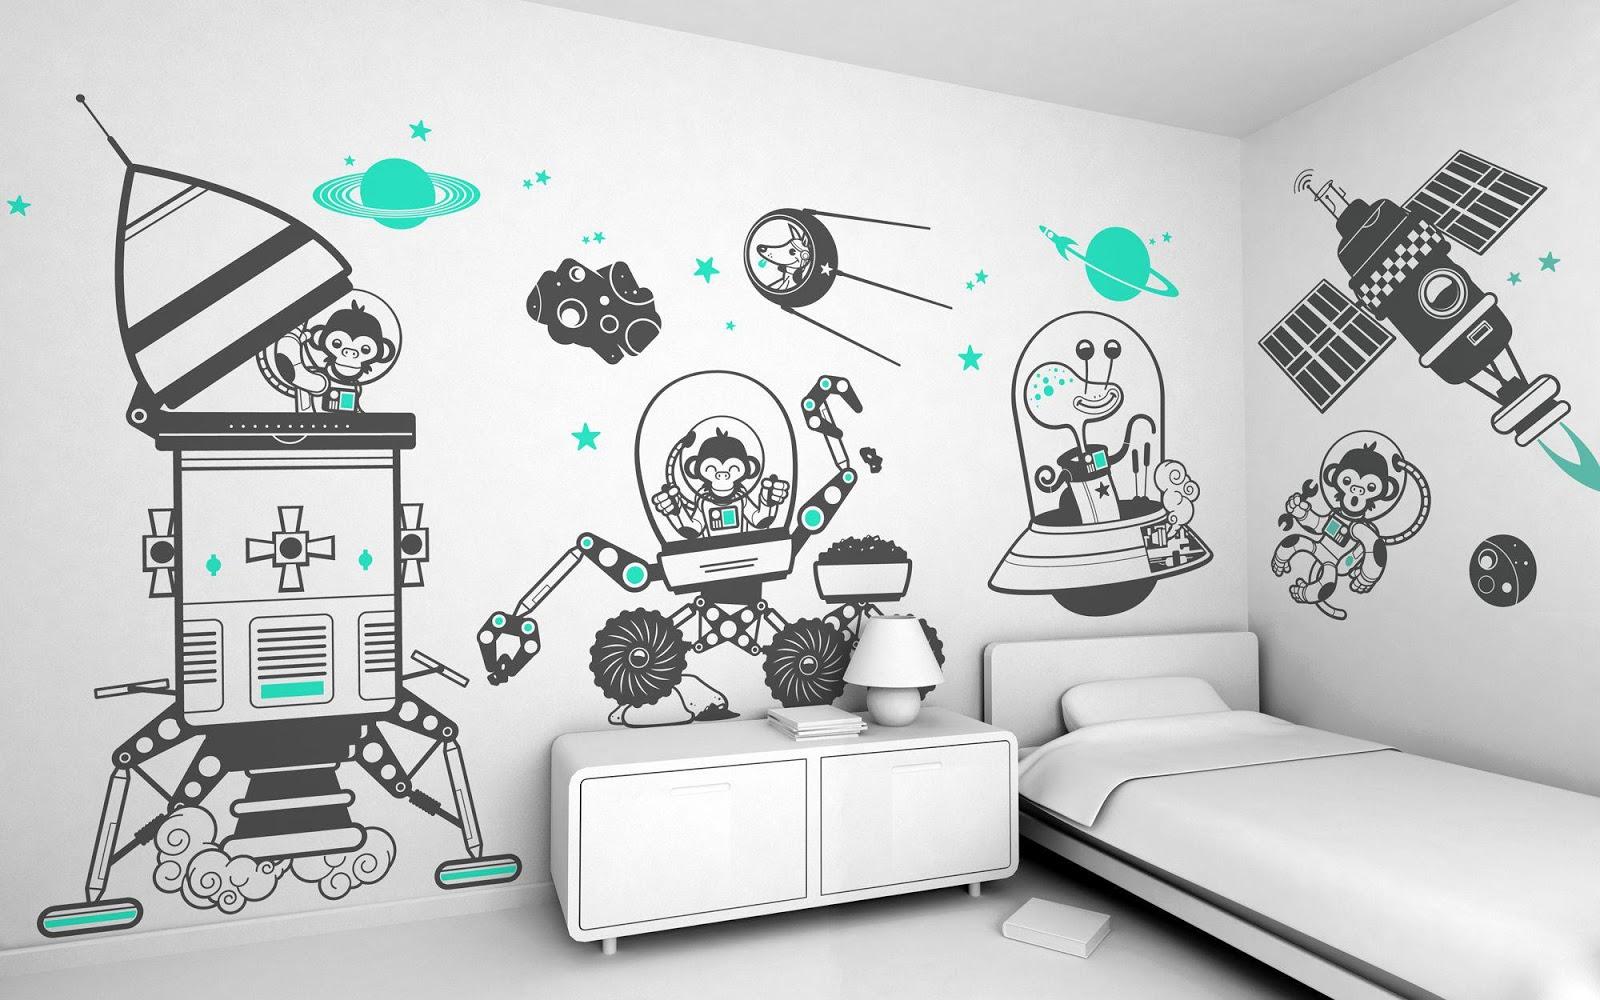 wall-art-for-kids-bedrooms-by-best-modern-interior-designer-for-kids-modern-bedroom-designs-in-white-bedroom-furniture